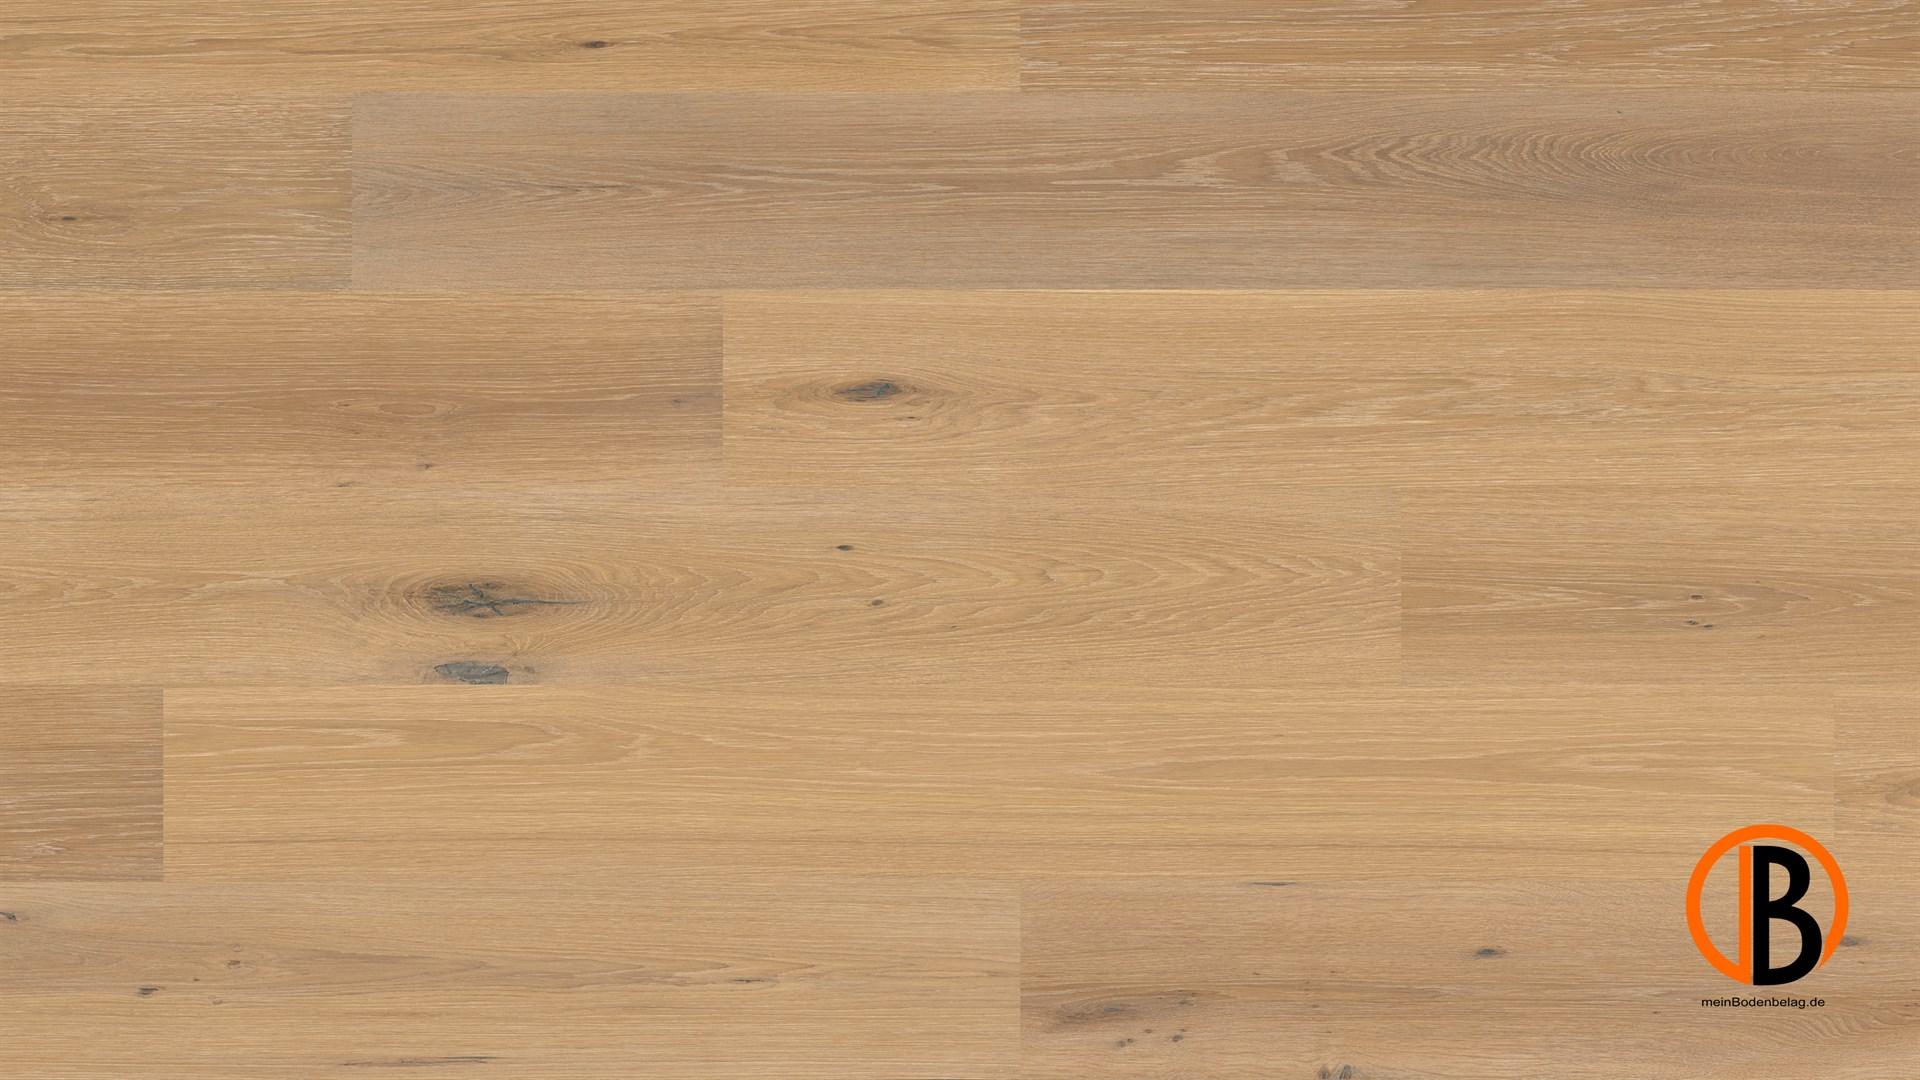 CINQUE FERTIGPARKETT SCHLOSSDIELE MATERA 220X26X1,5 | 10001814;0 | Bild 1